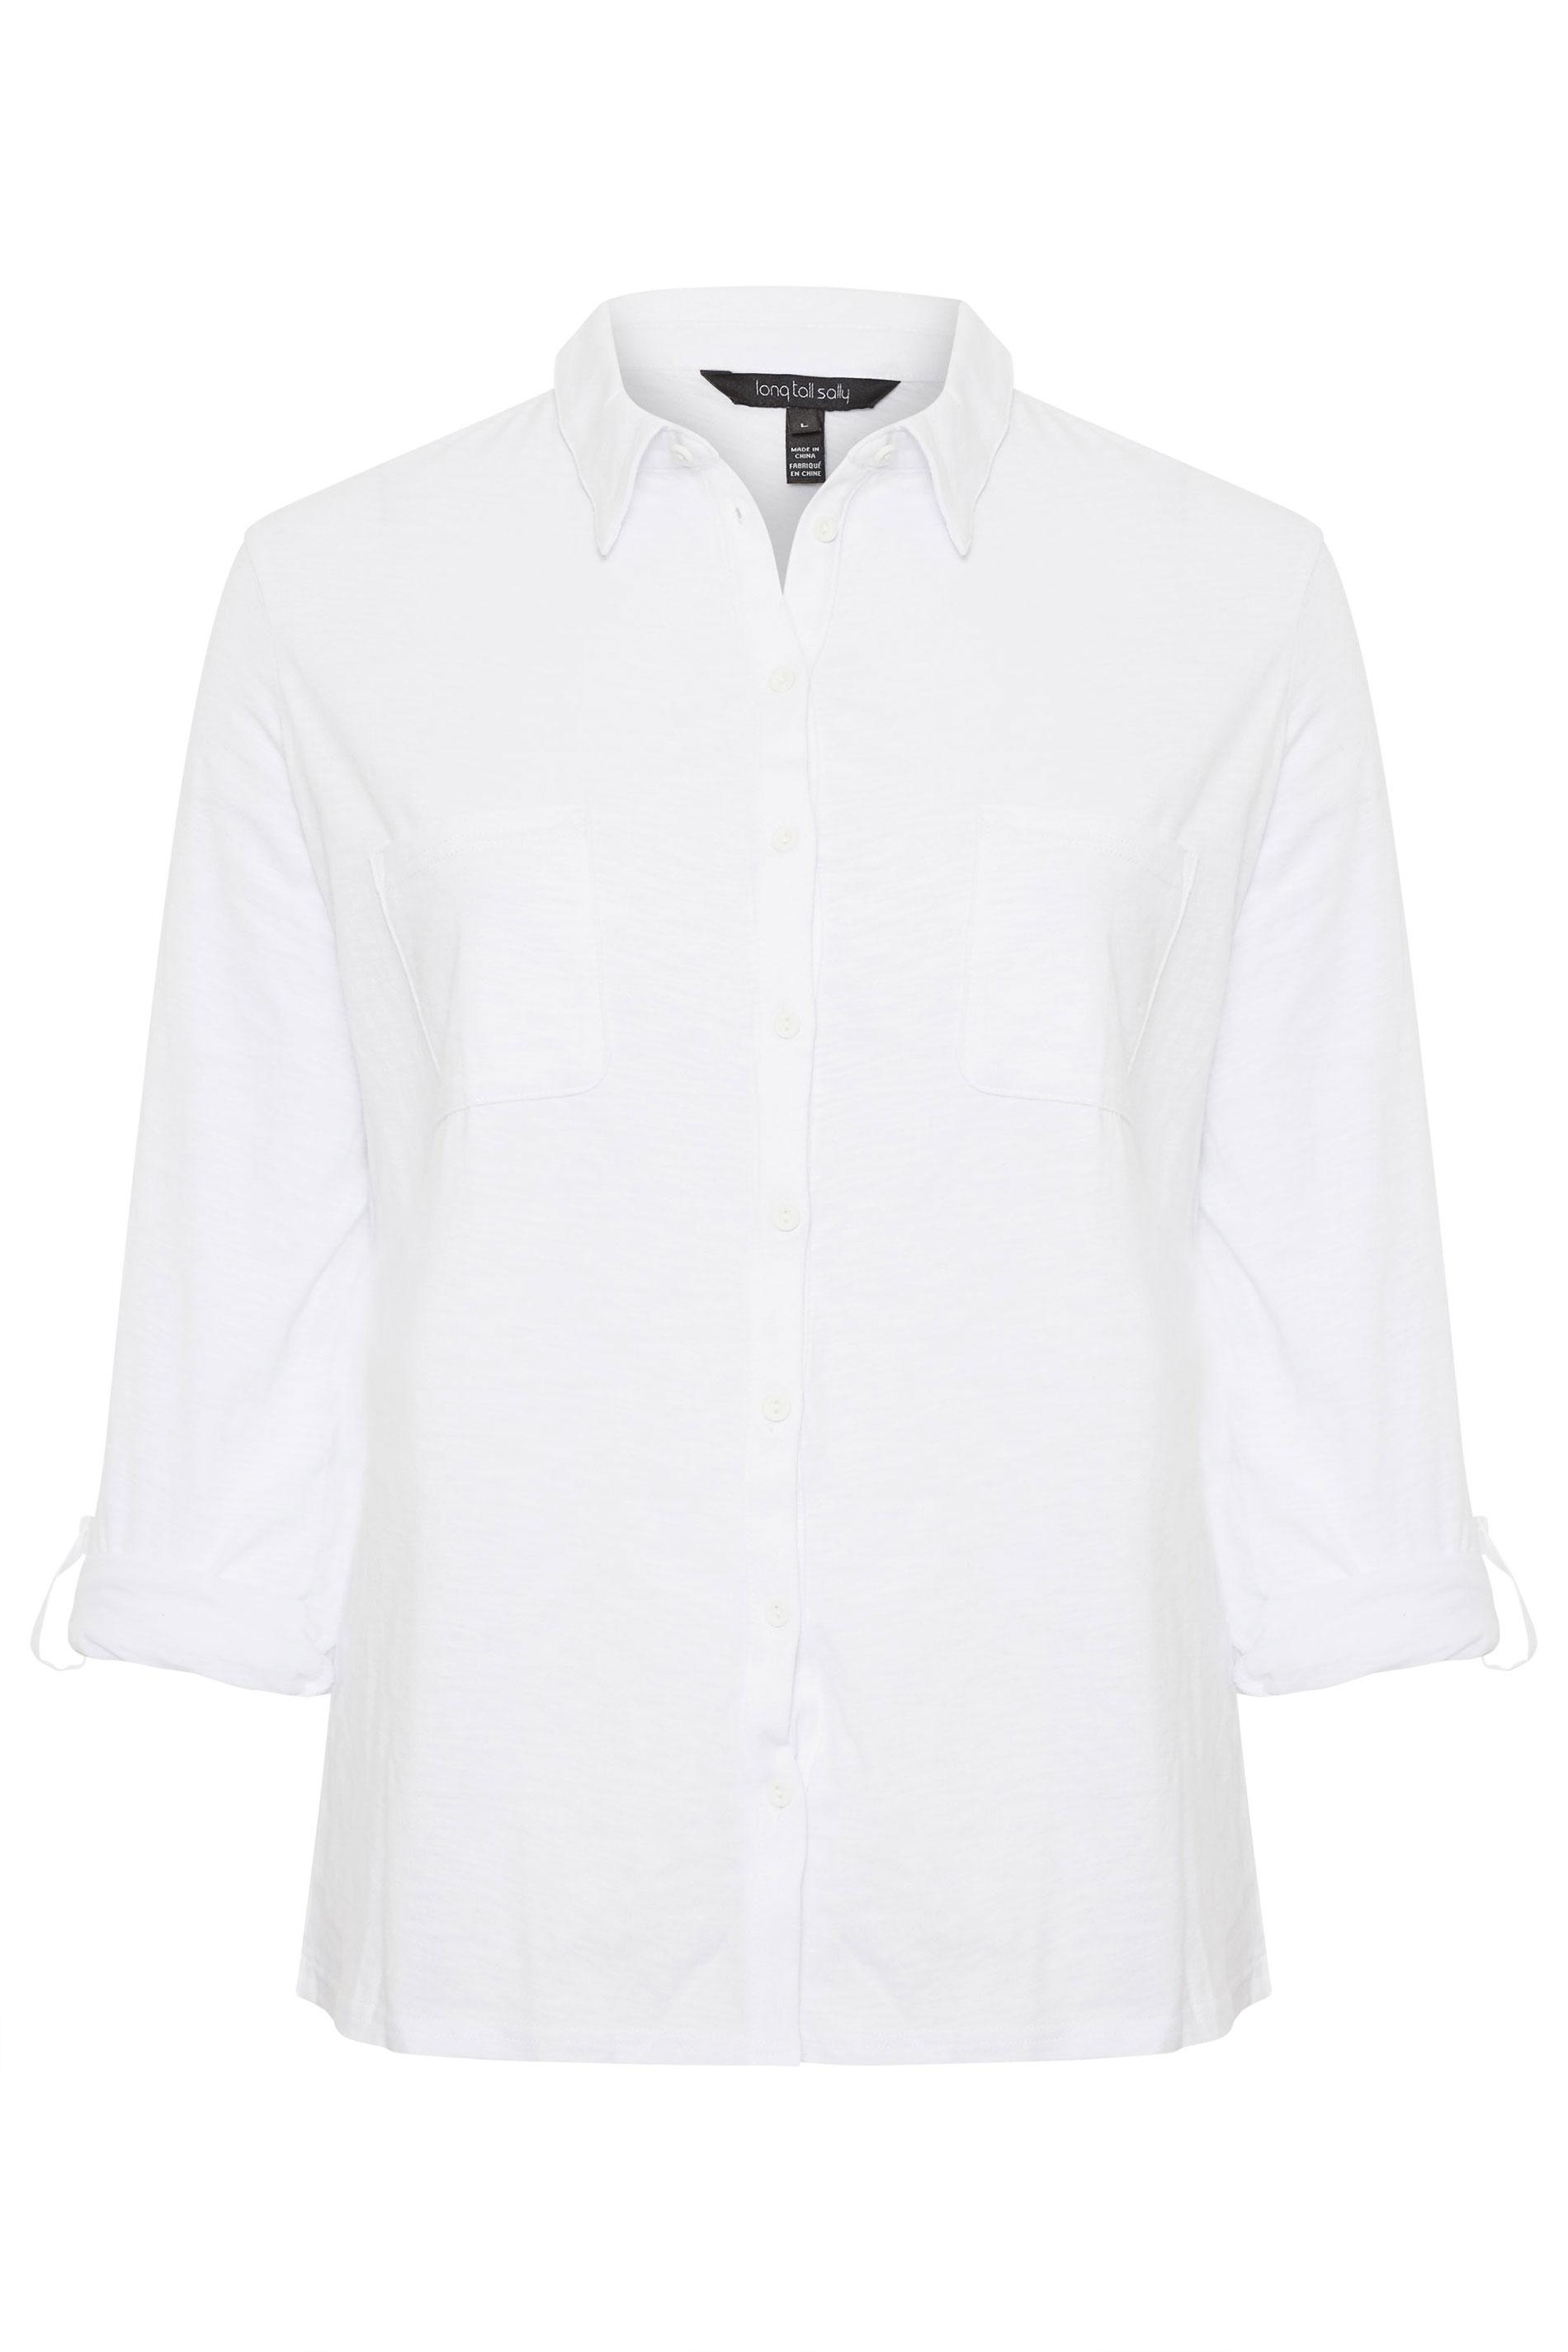 White Washed Jersey Shirt